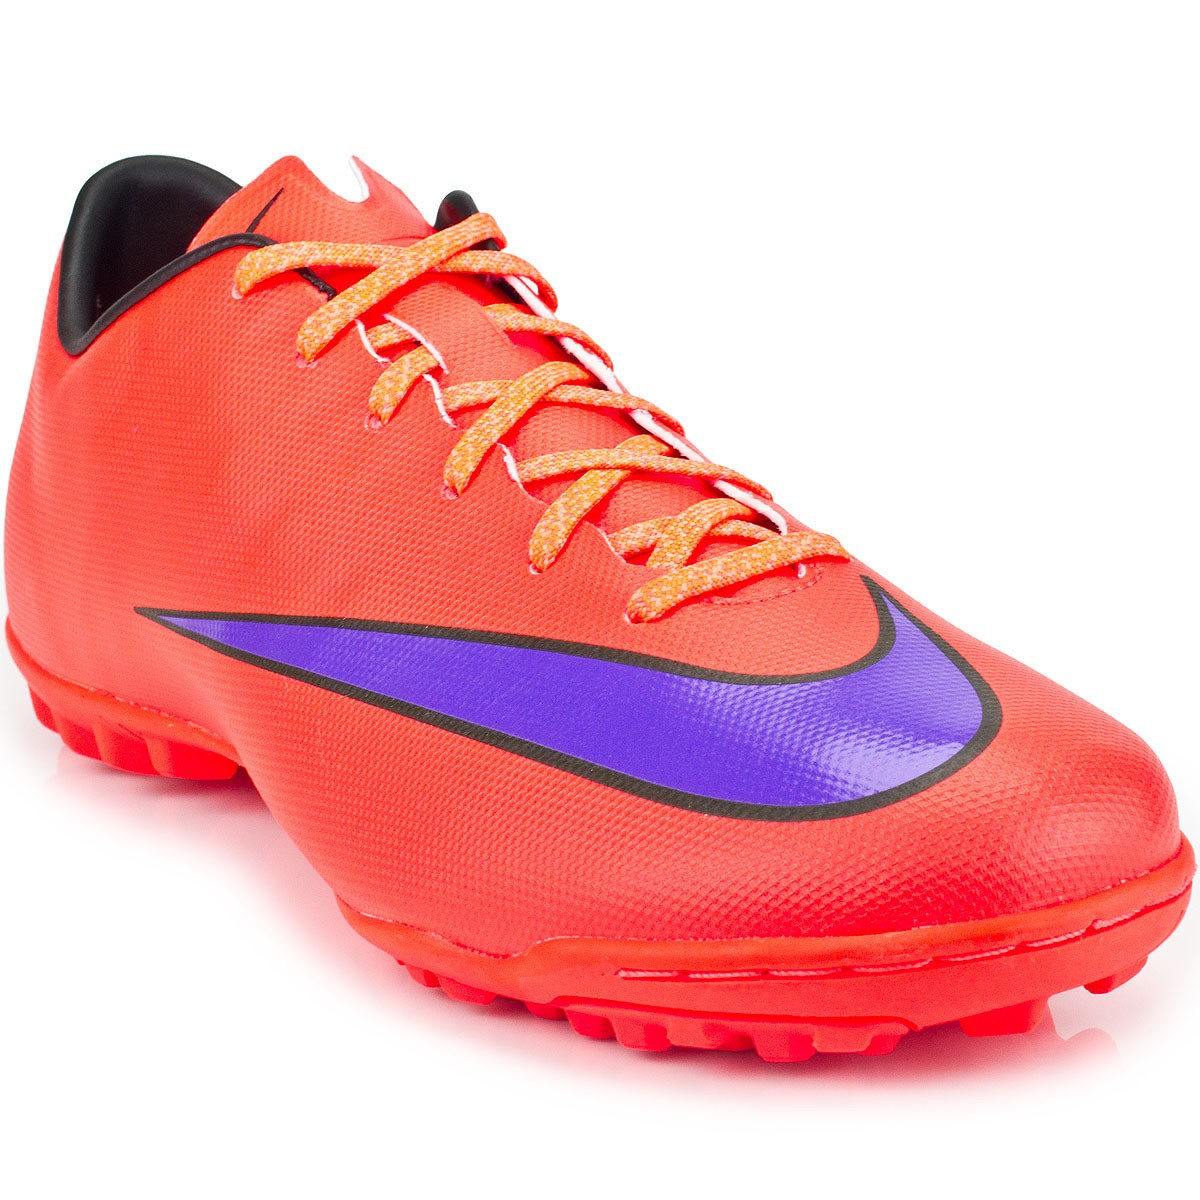 1d38e4eaa5cef Chuteira Nike Mercurial Victory V TF 651646